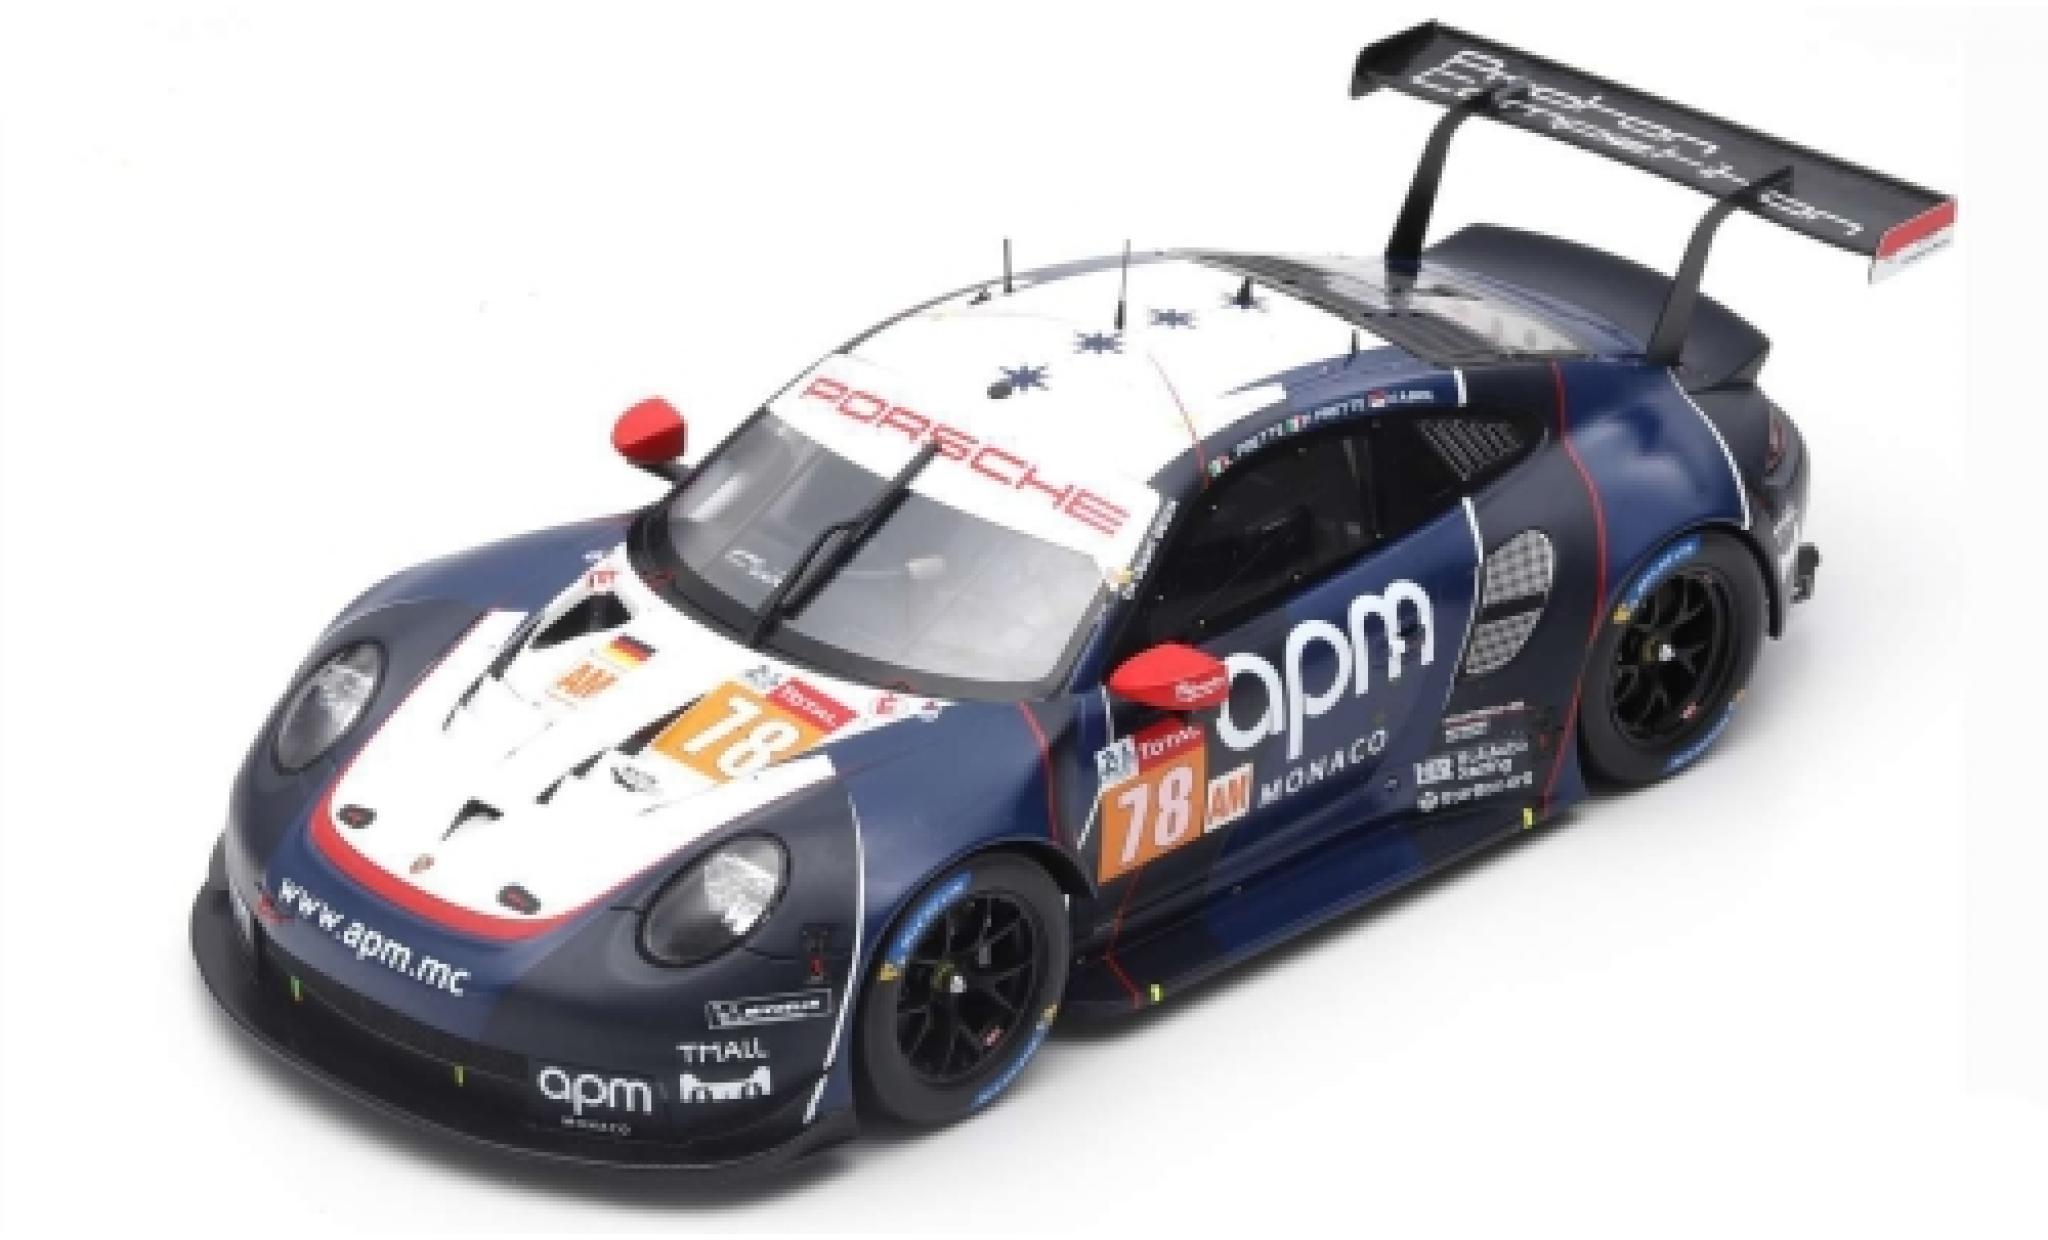 Porsche 992 RSR 1/43 Spark 911 (991) No.78 Predon Competition 24h Le Mans 2019 L.Prette/P.Prette/V.Abril